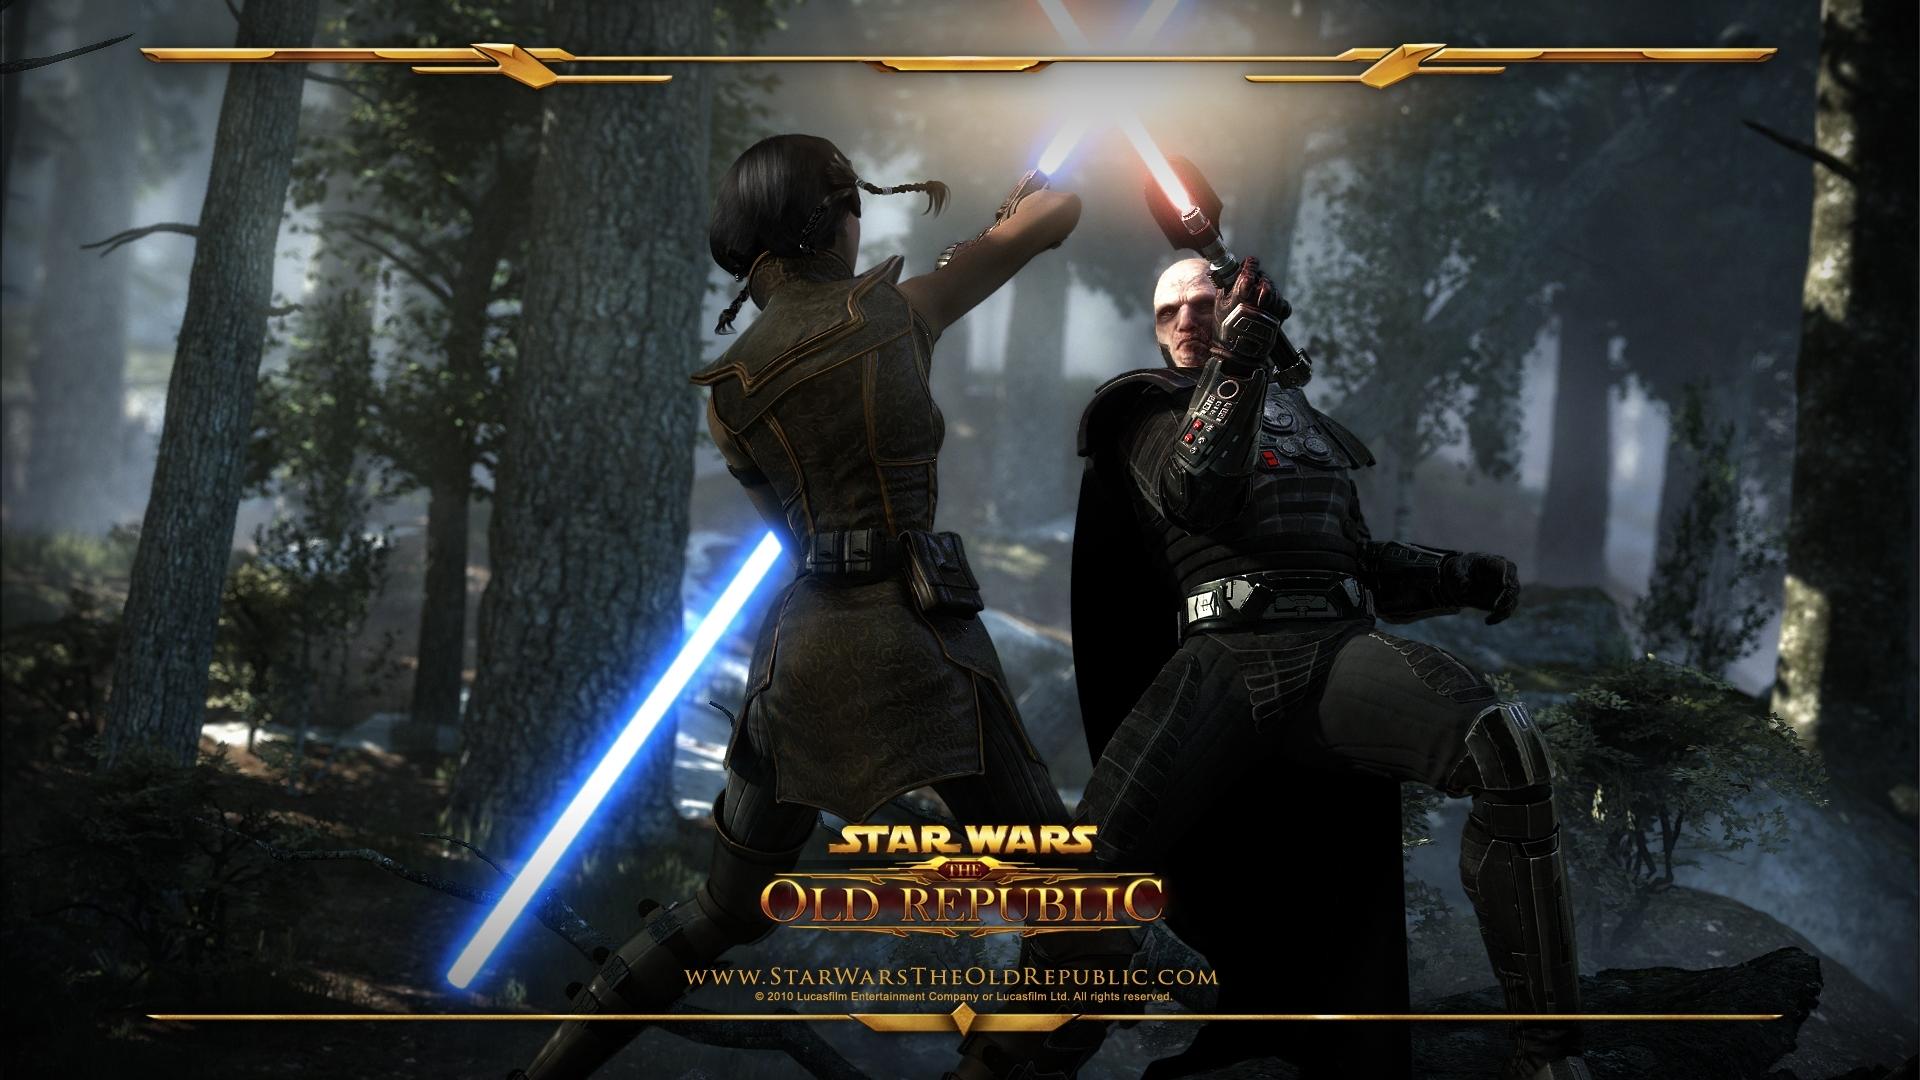 star wars star wars the old republic games 1920x1080